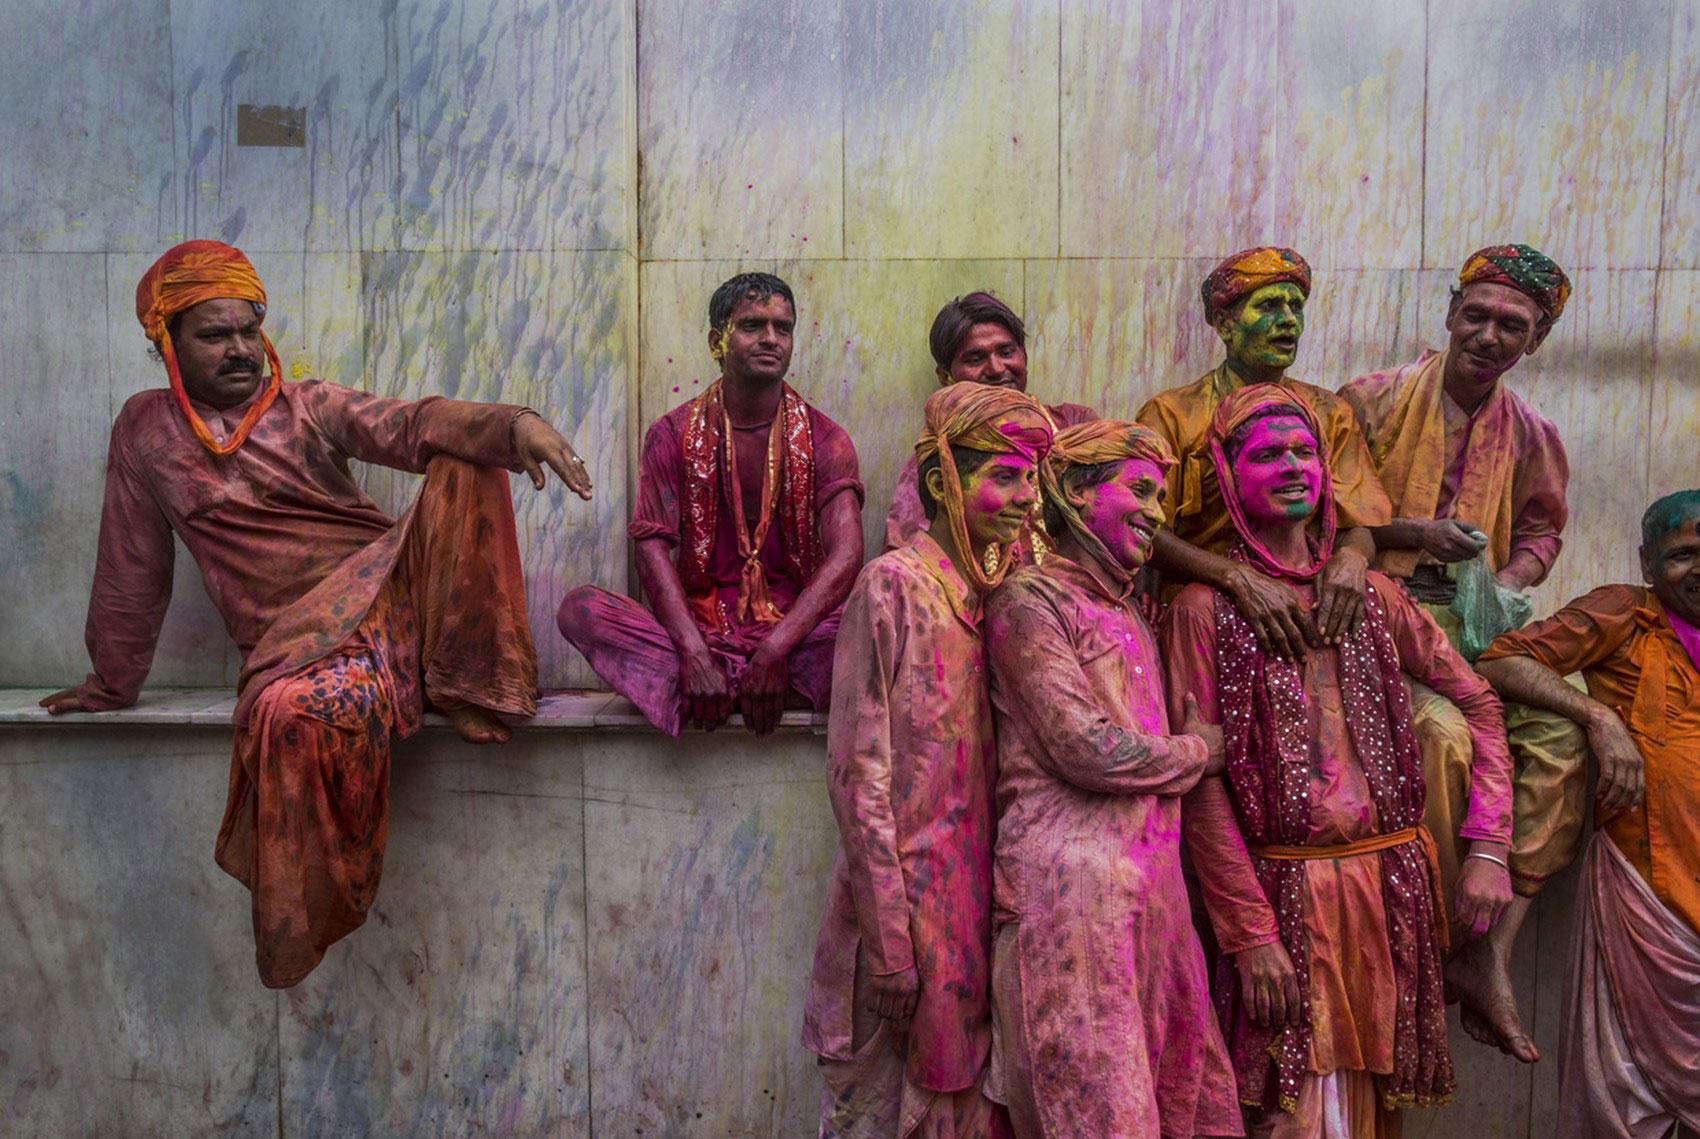 празднование Холи в деревне Nundgaon